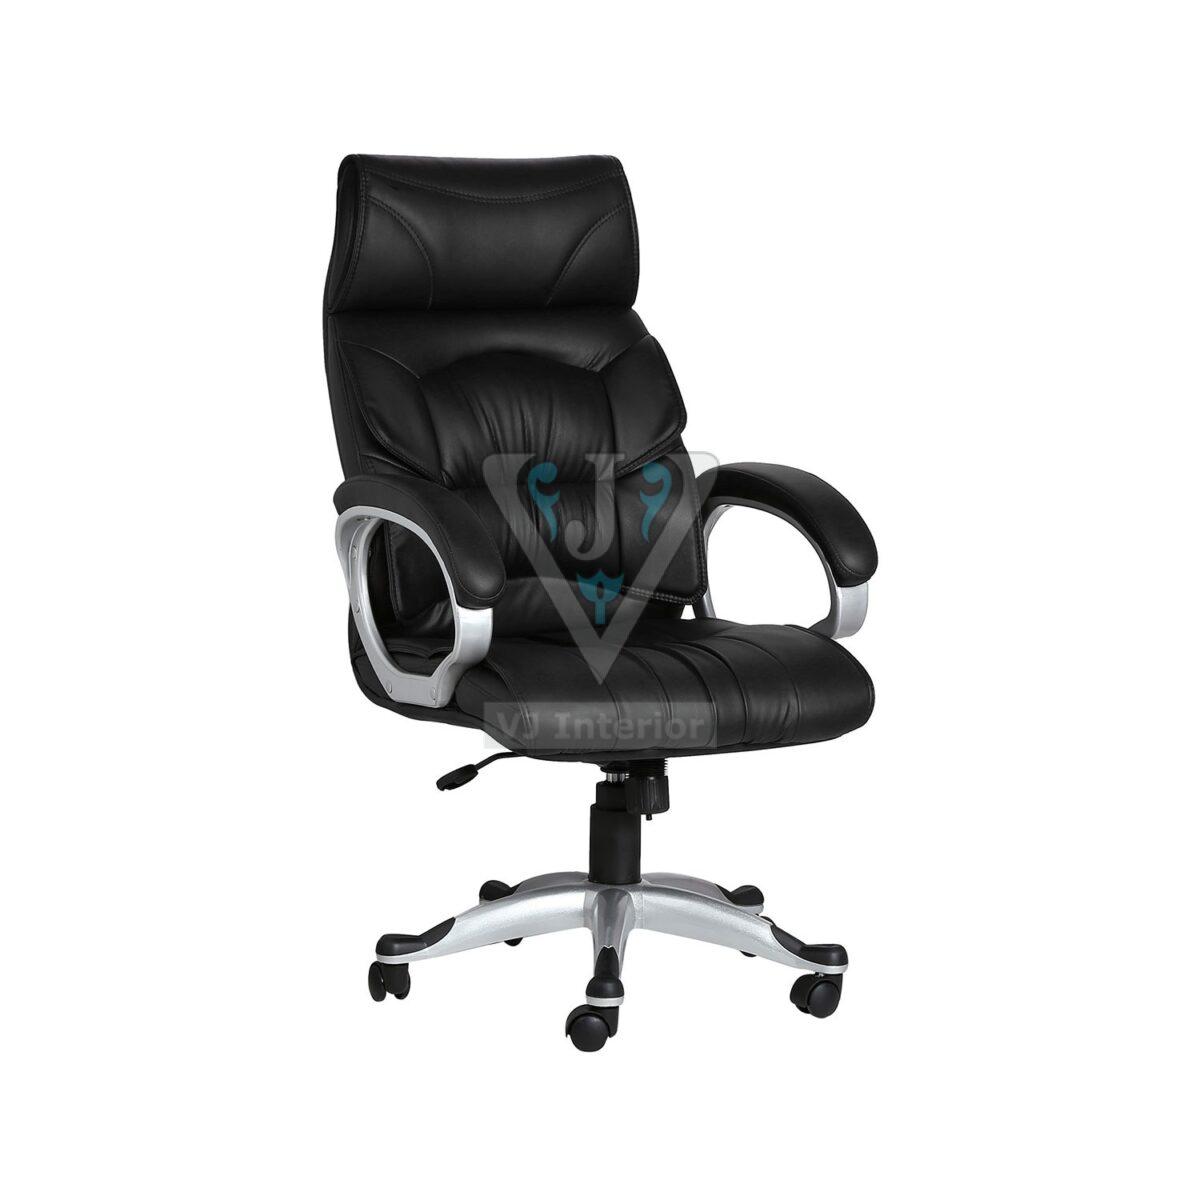 Executive High Back Office Chair (Doblepiel)